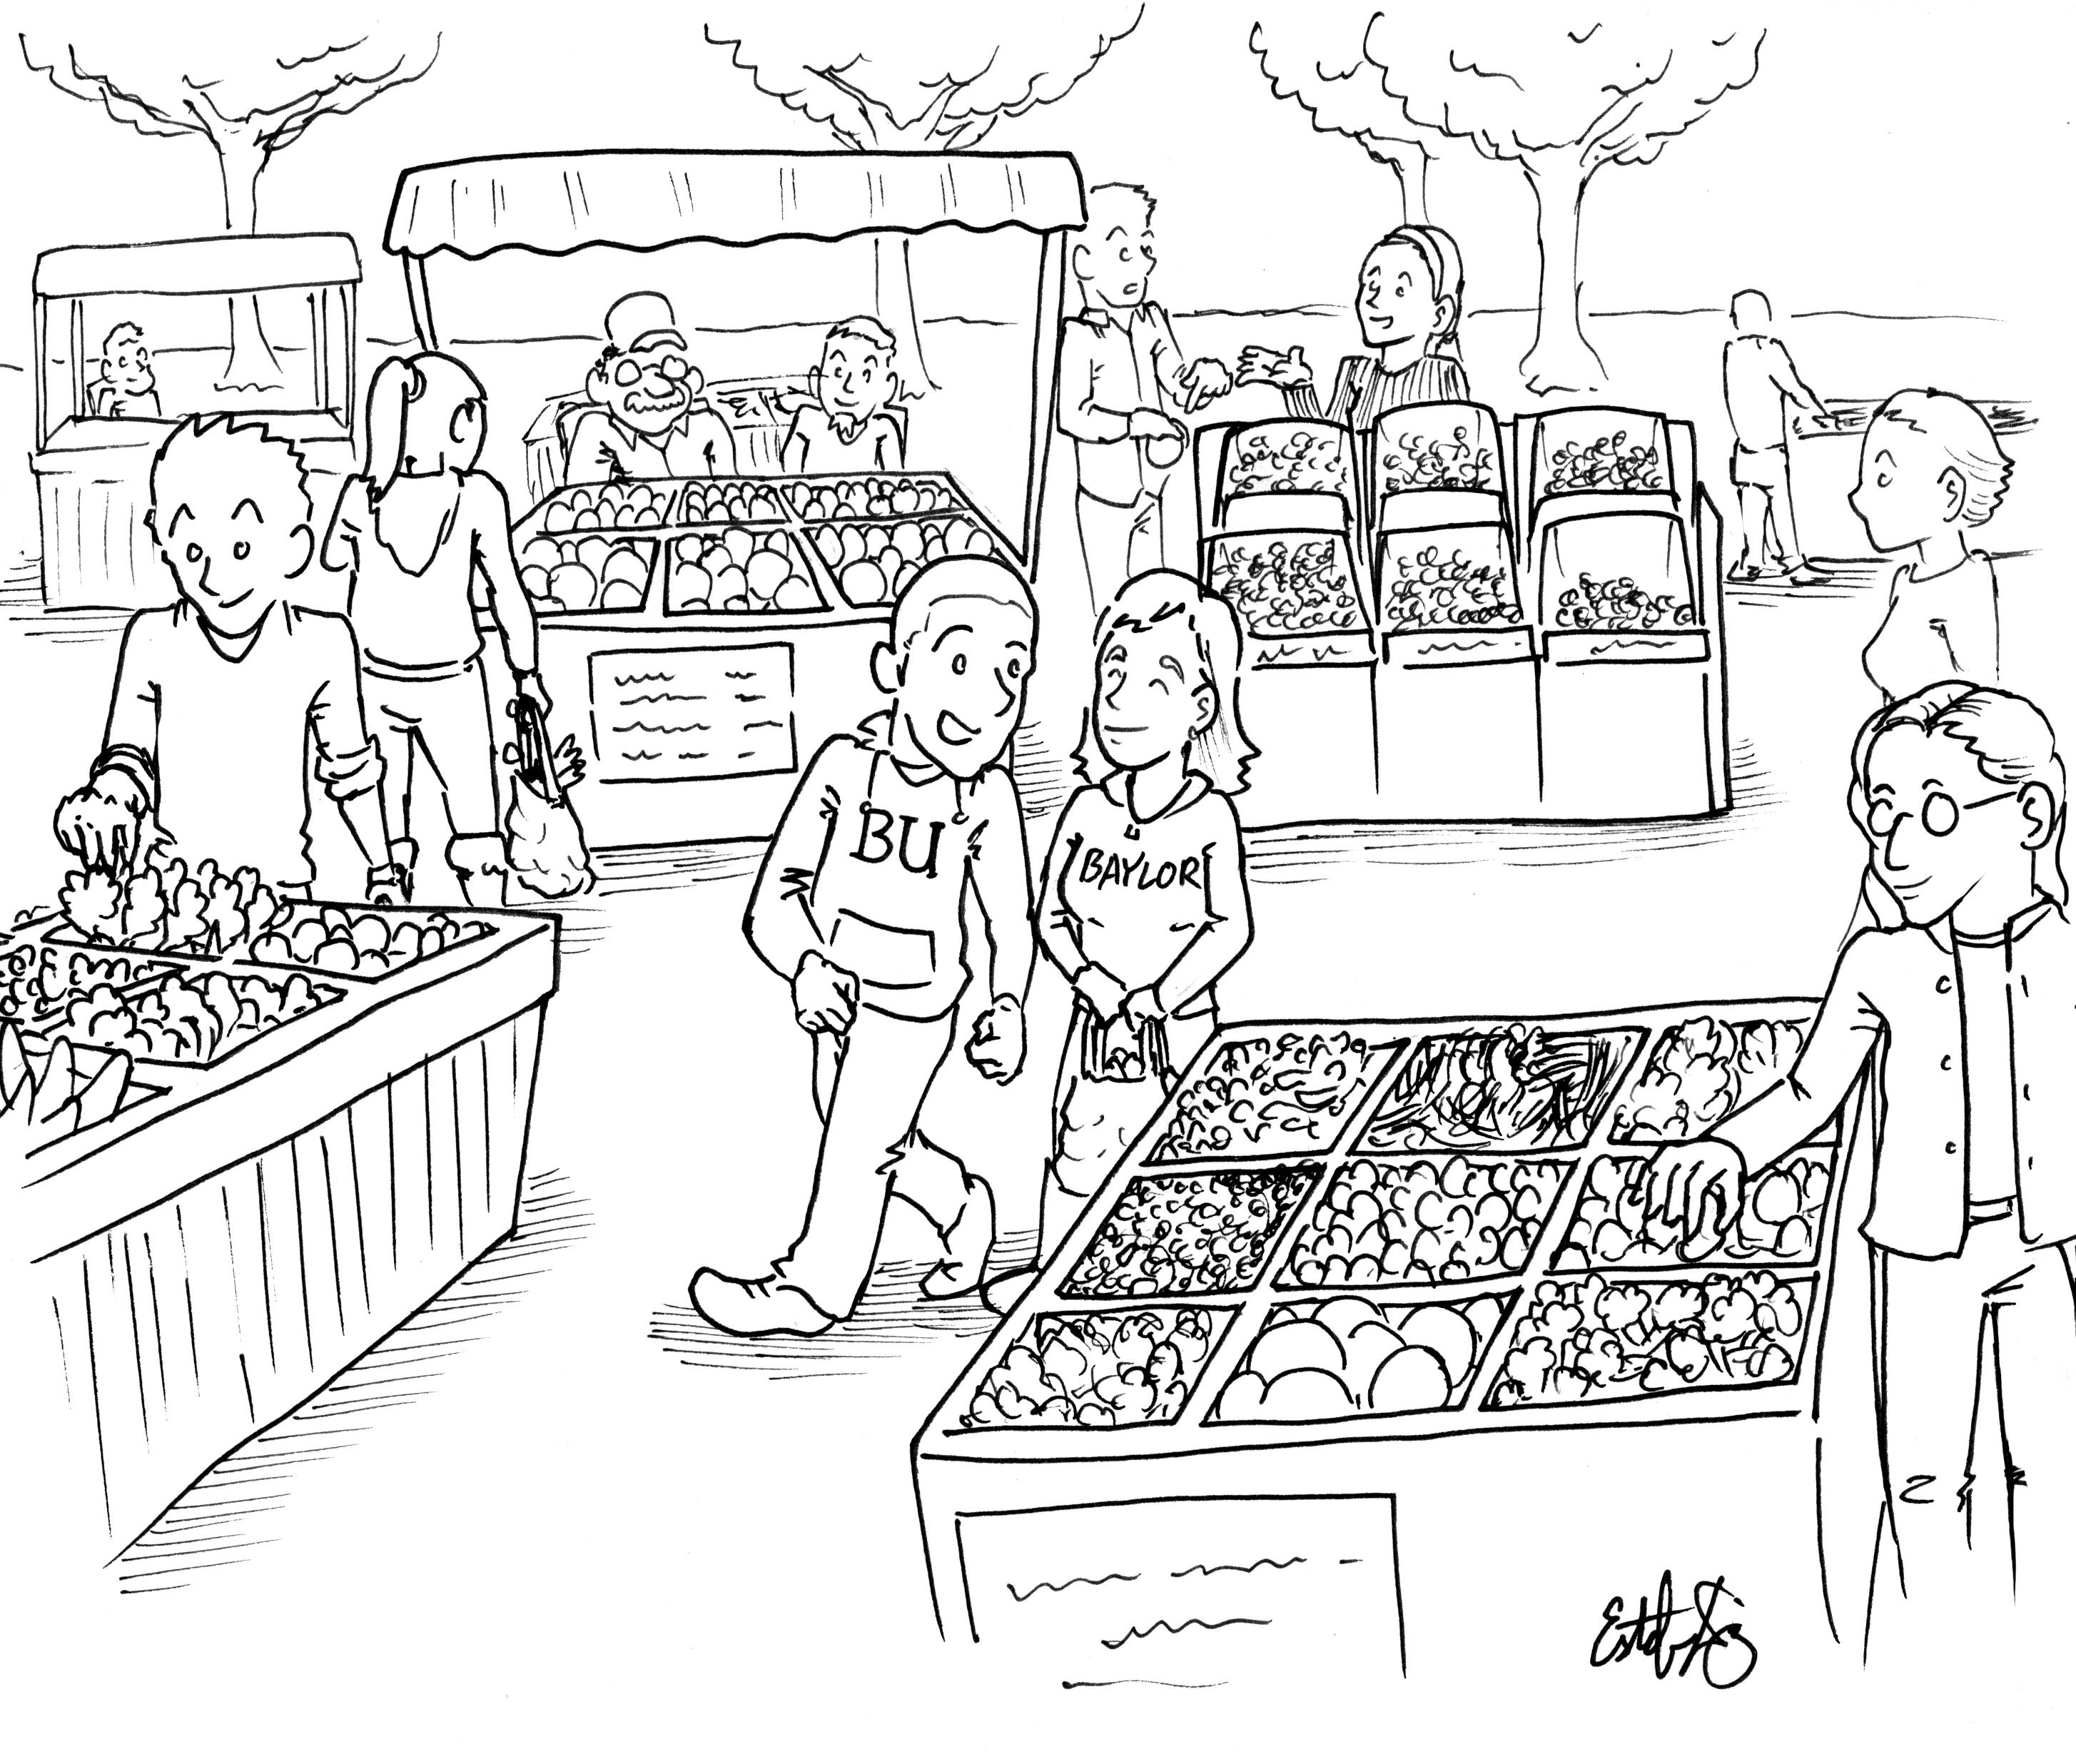 Editorial Farmers Market Brings Much Needed Fresh Food